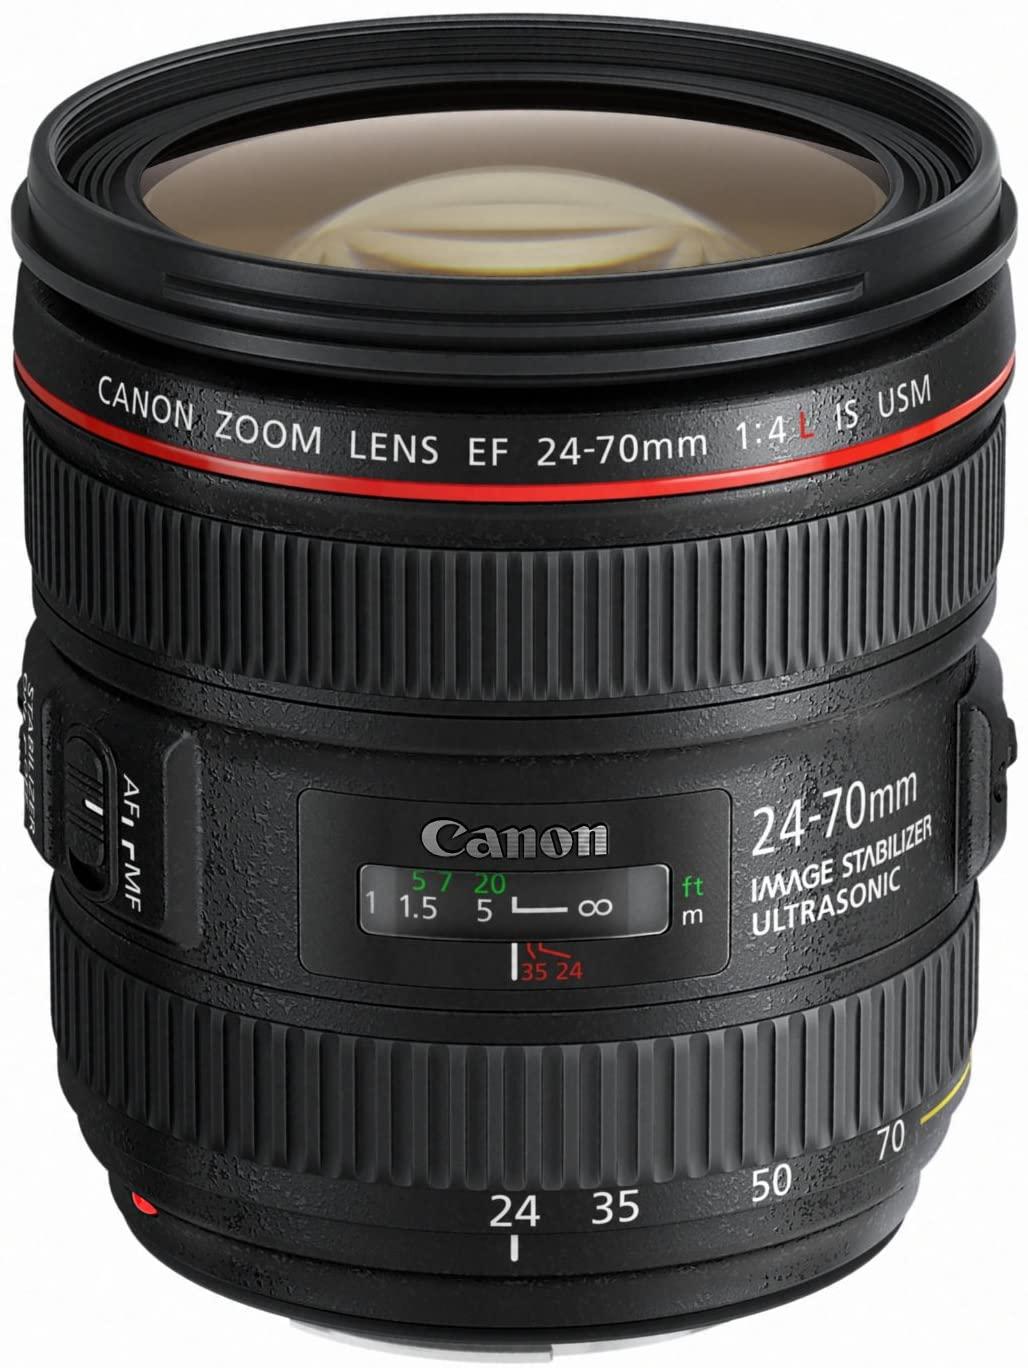 Lente Canon EF 24-70mm f/4 IS USM